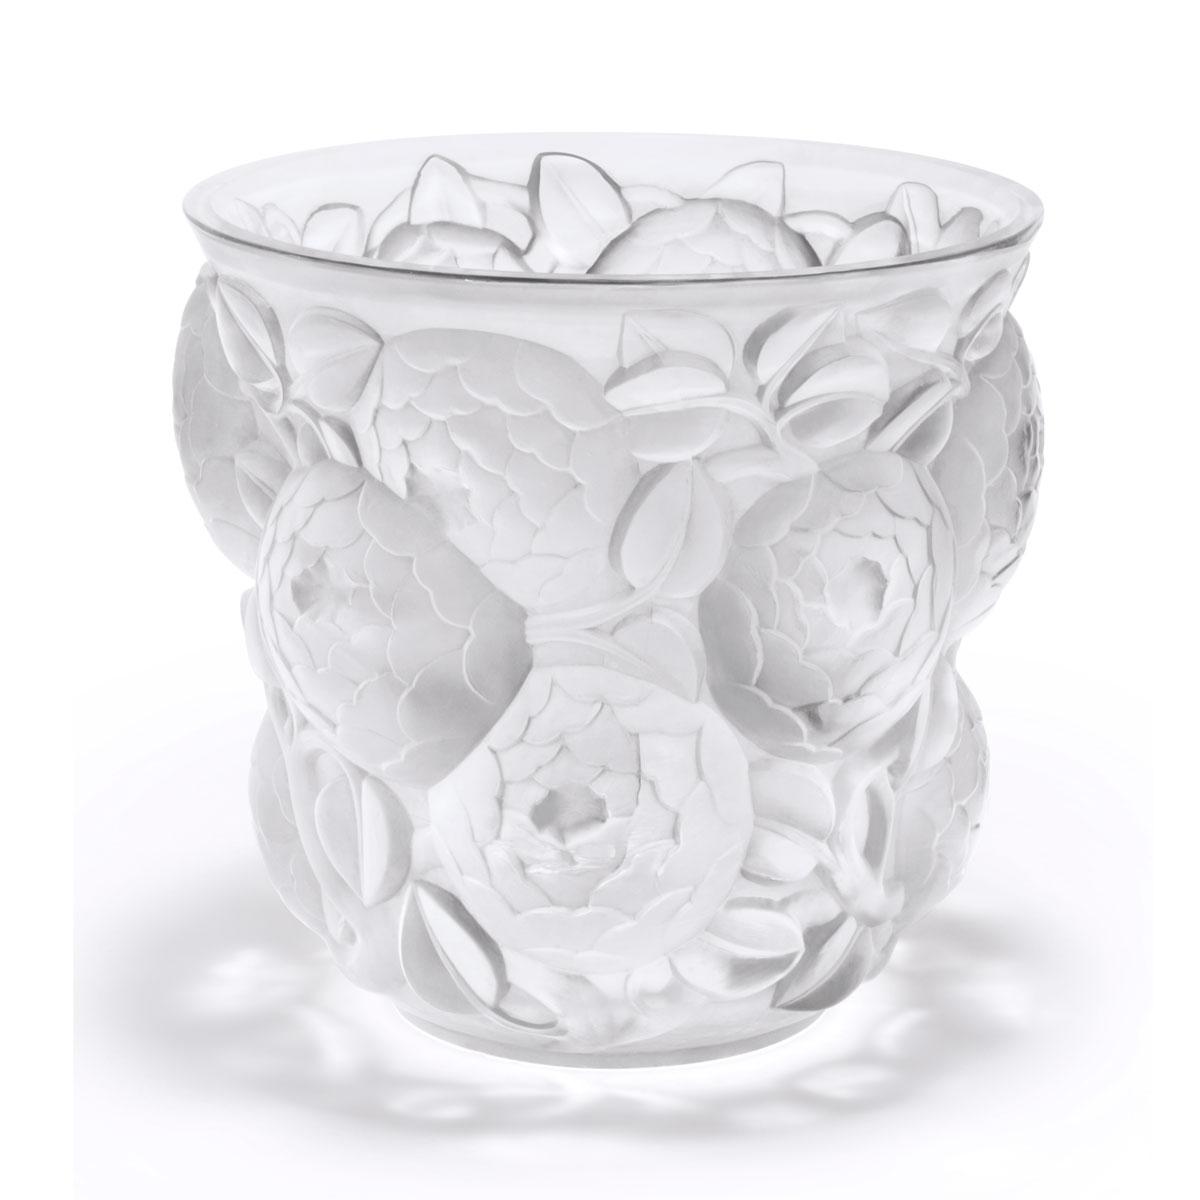 Lalique Crystal, Oran Crystal Vase, Numbered Edition